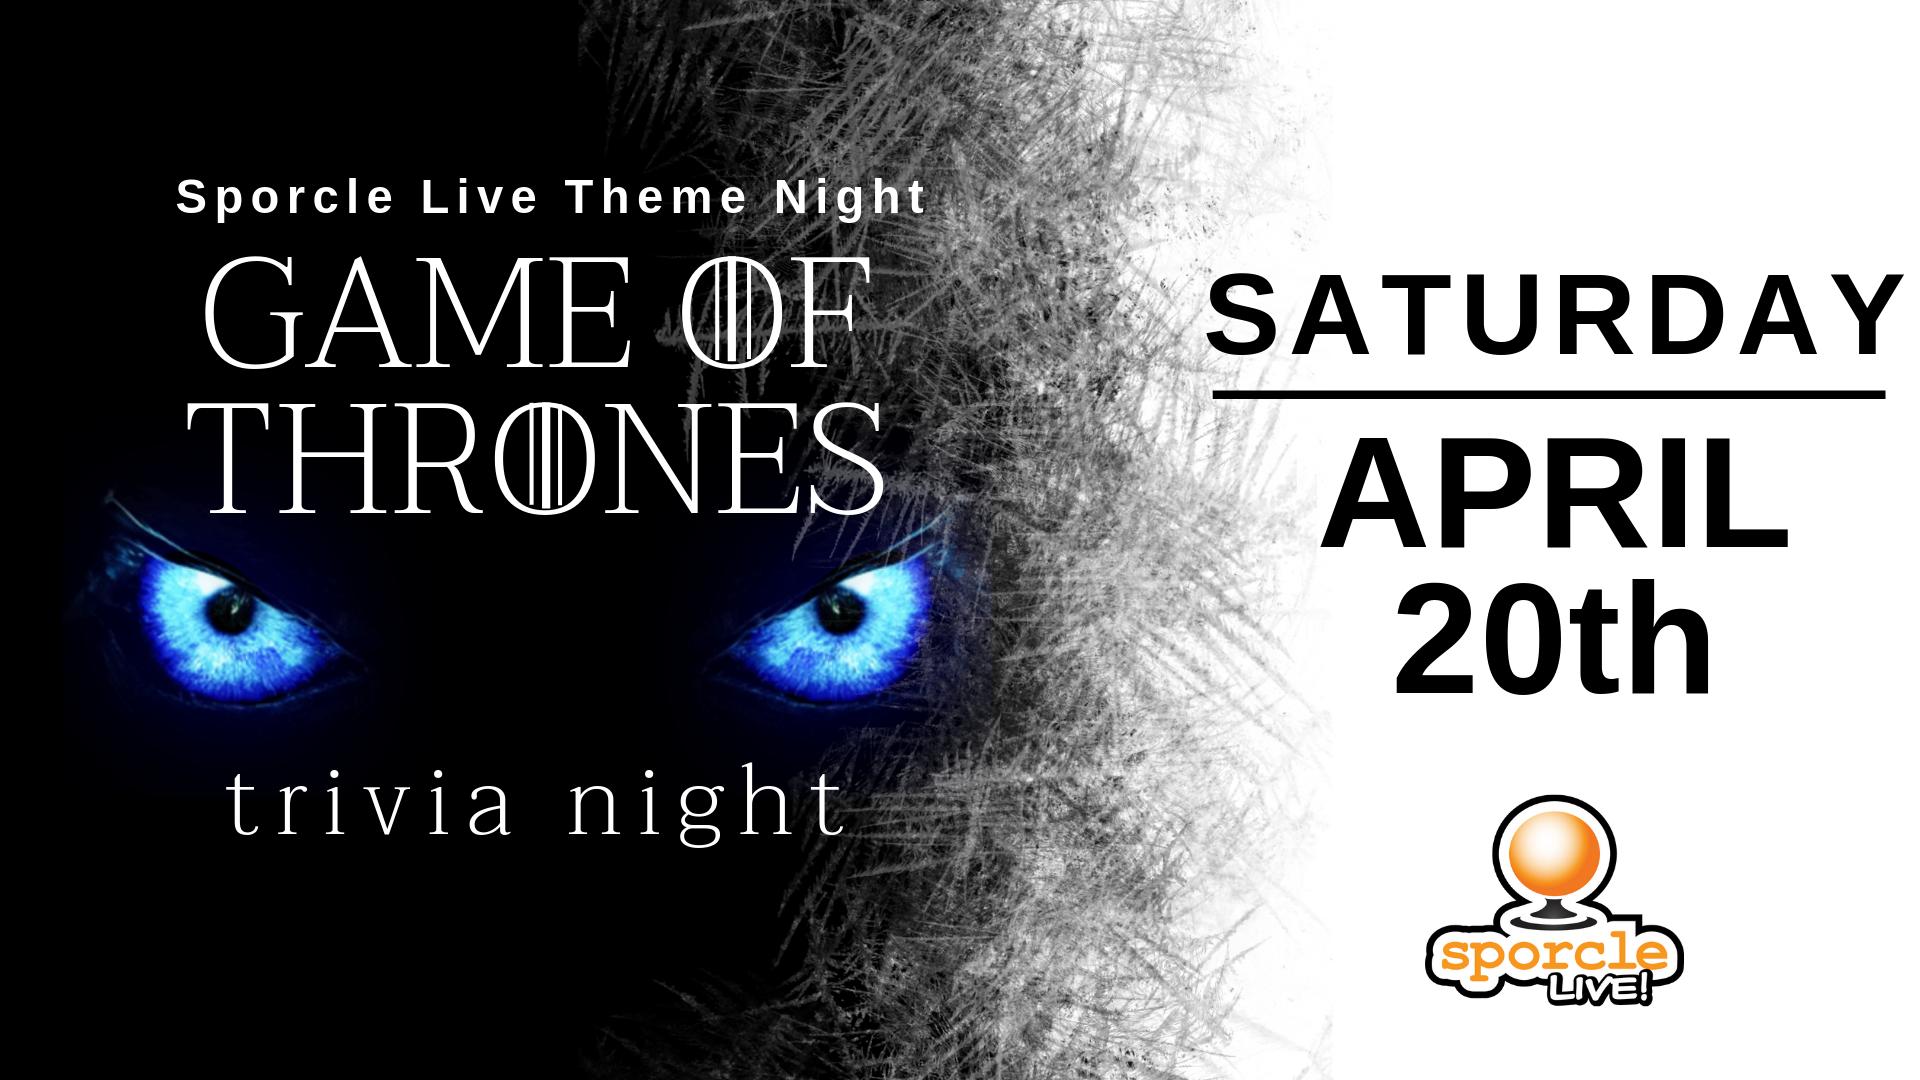 Game of Thrones Trivia - Minneapolis